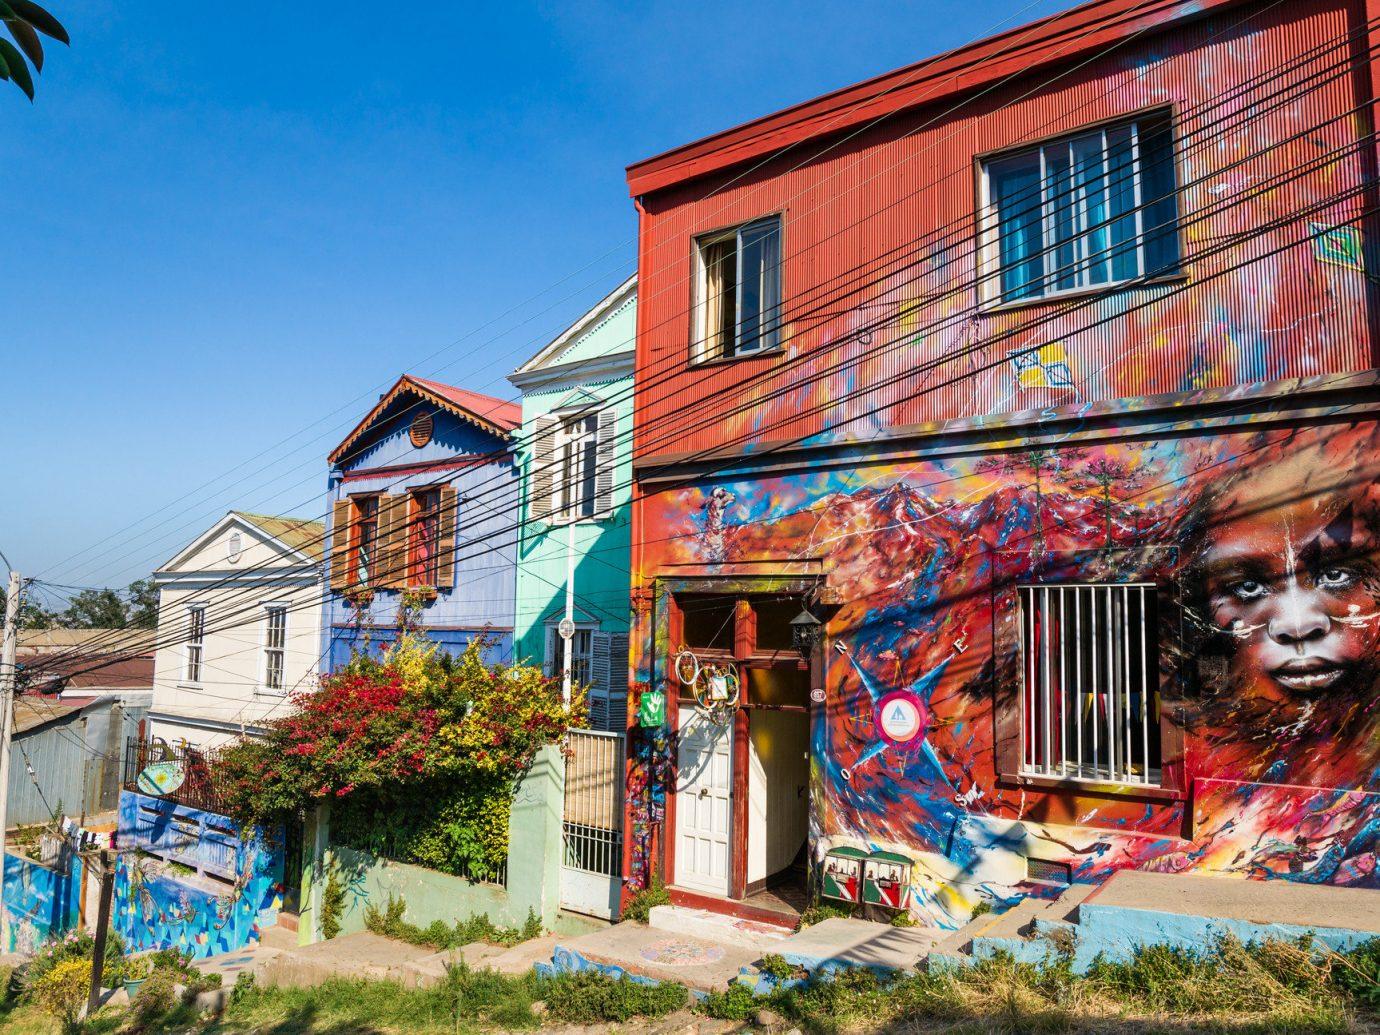 Trip Ideas building outdoor color Town neighbourhood urban area house art mural Village colorful